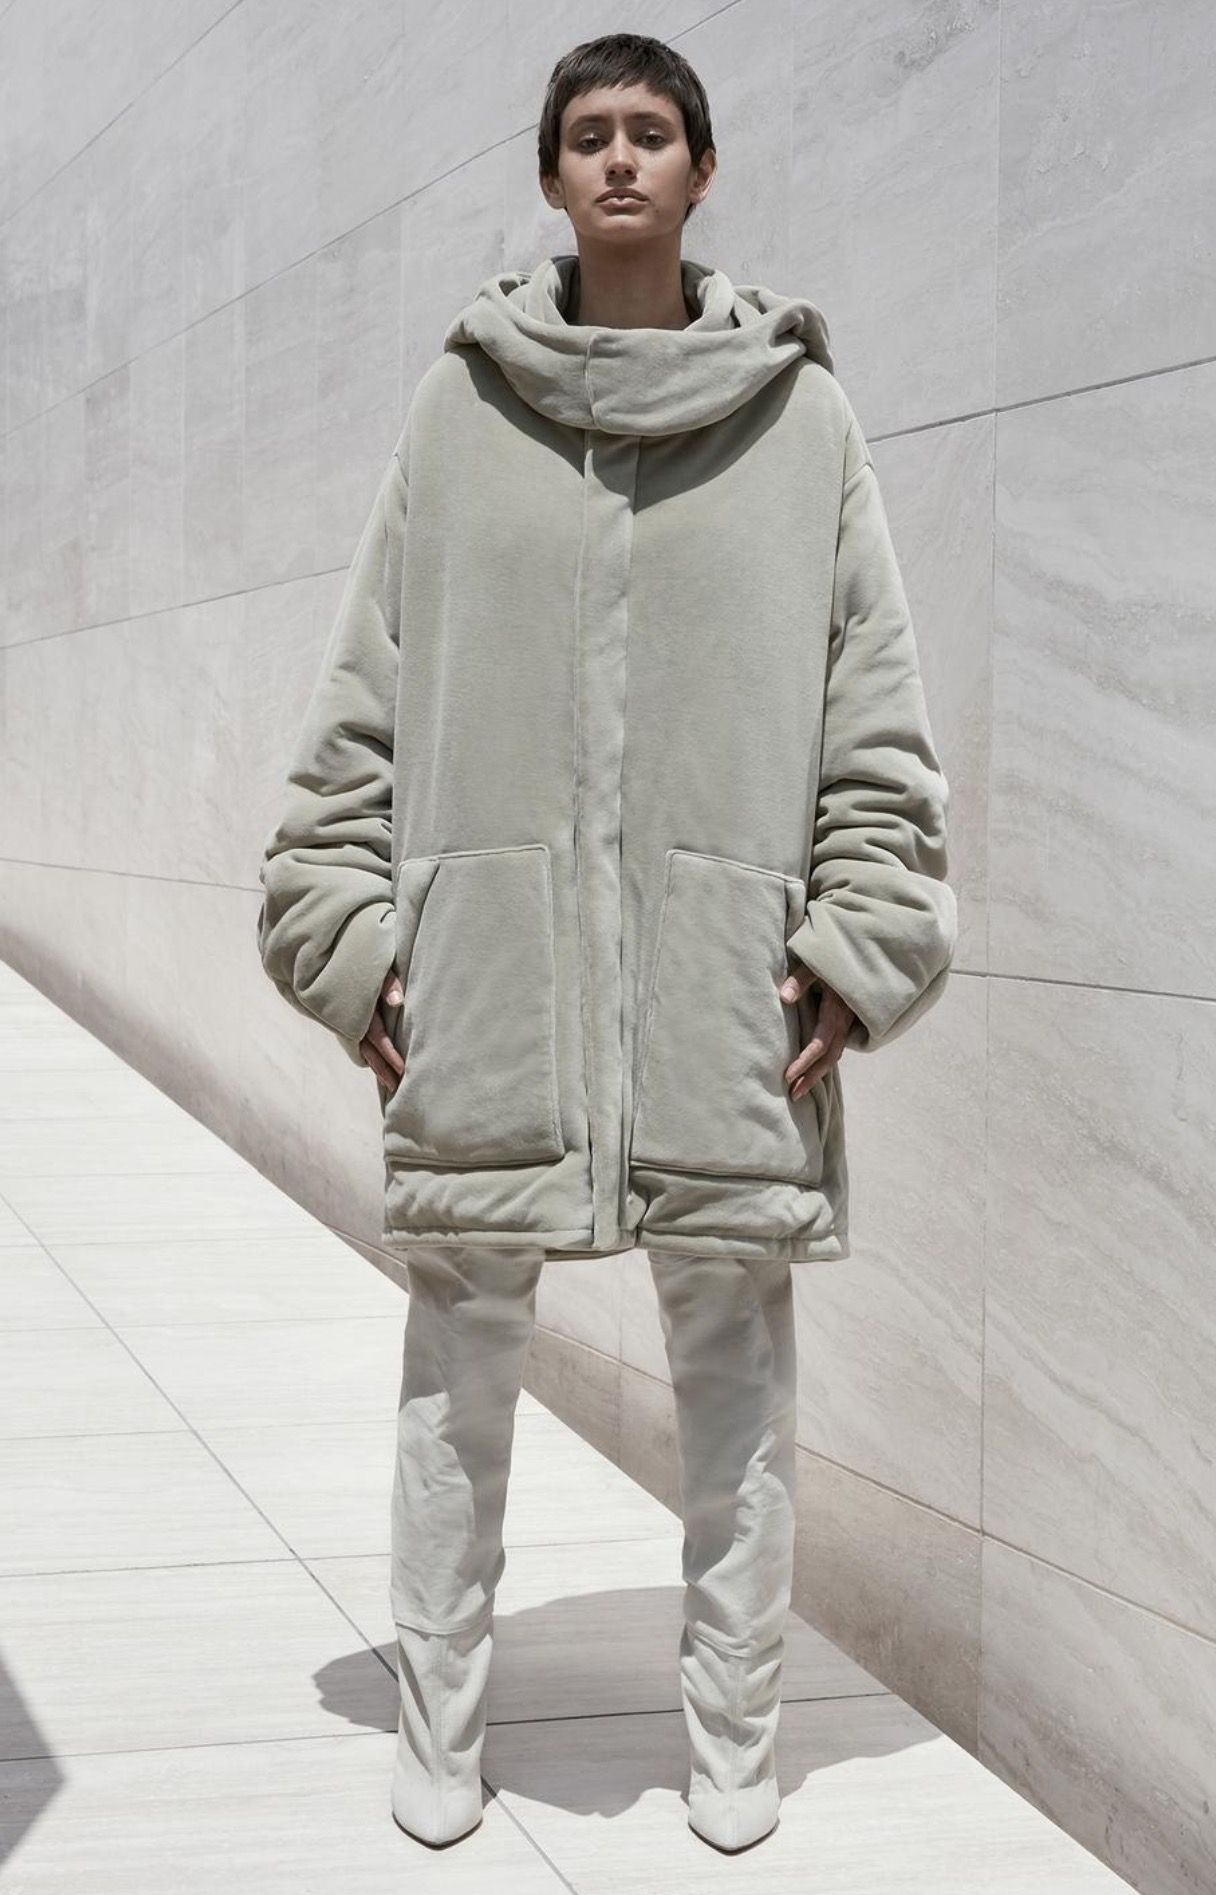 Season 4 Yeezy Yeezy Fashion Yeezy Outfit Yeezy By Kanye West [ 1895 x 1216 Pixel ]